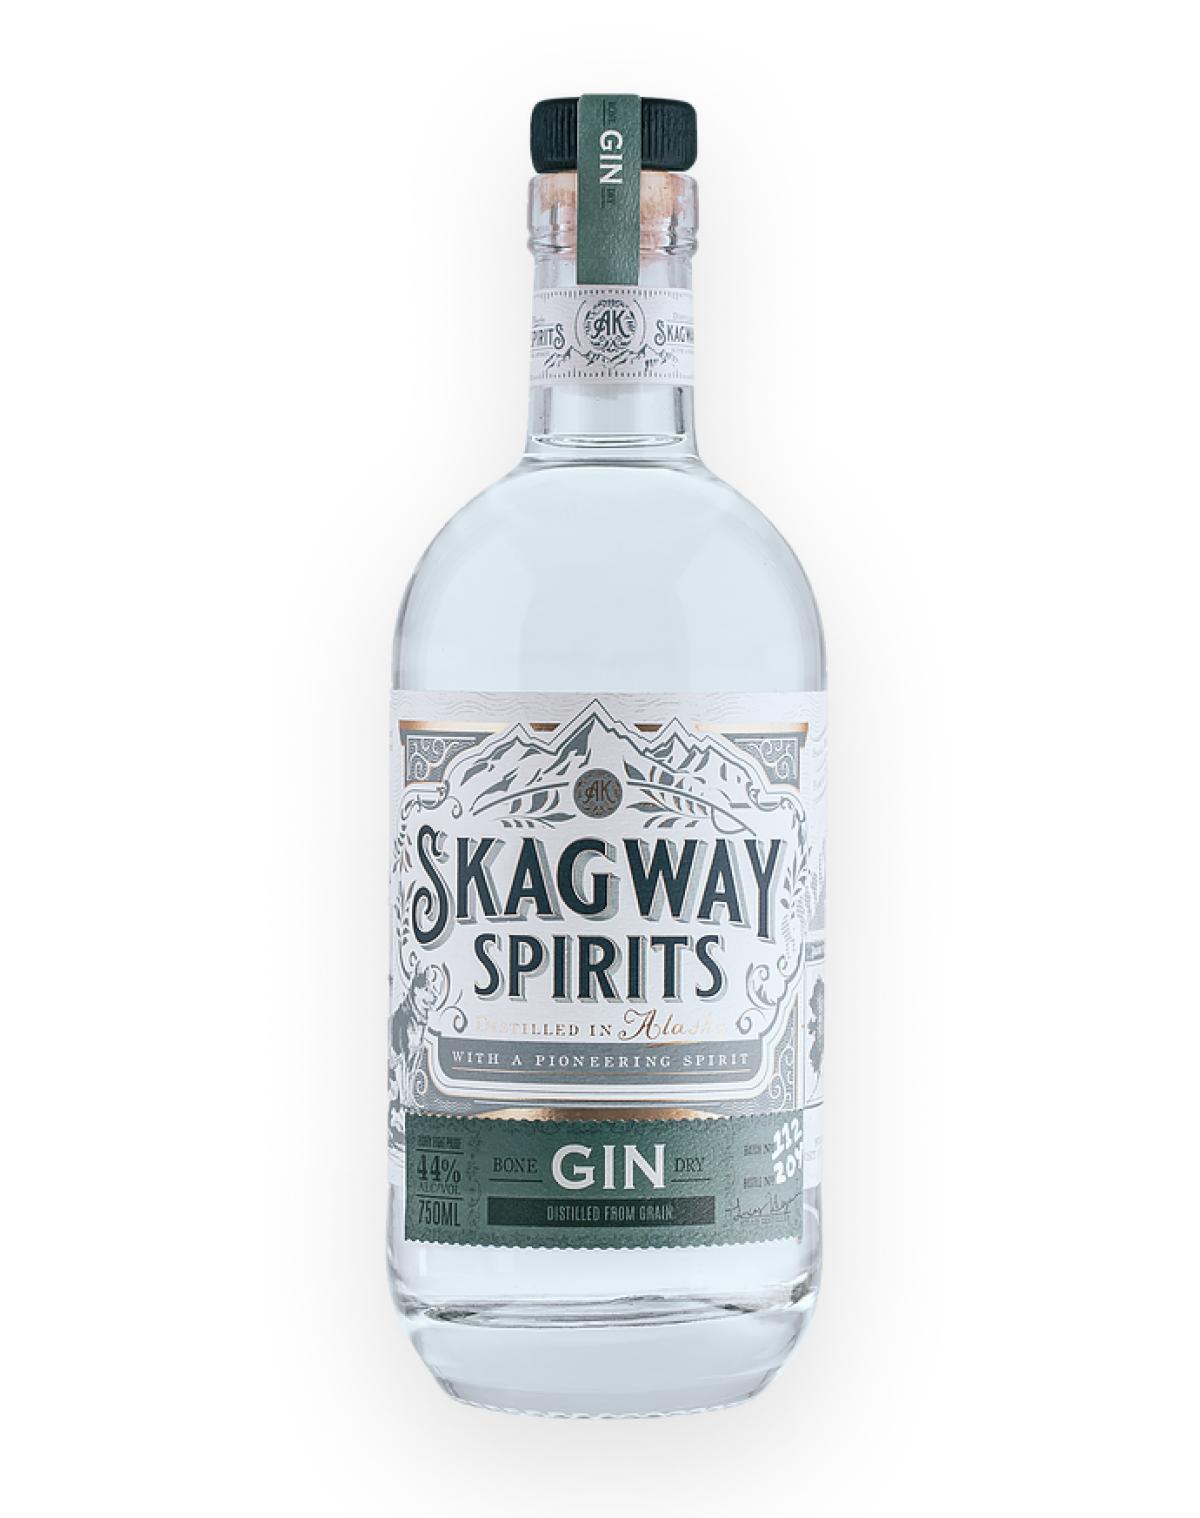 A beautiful bottle of Bone Dry Gin